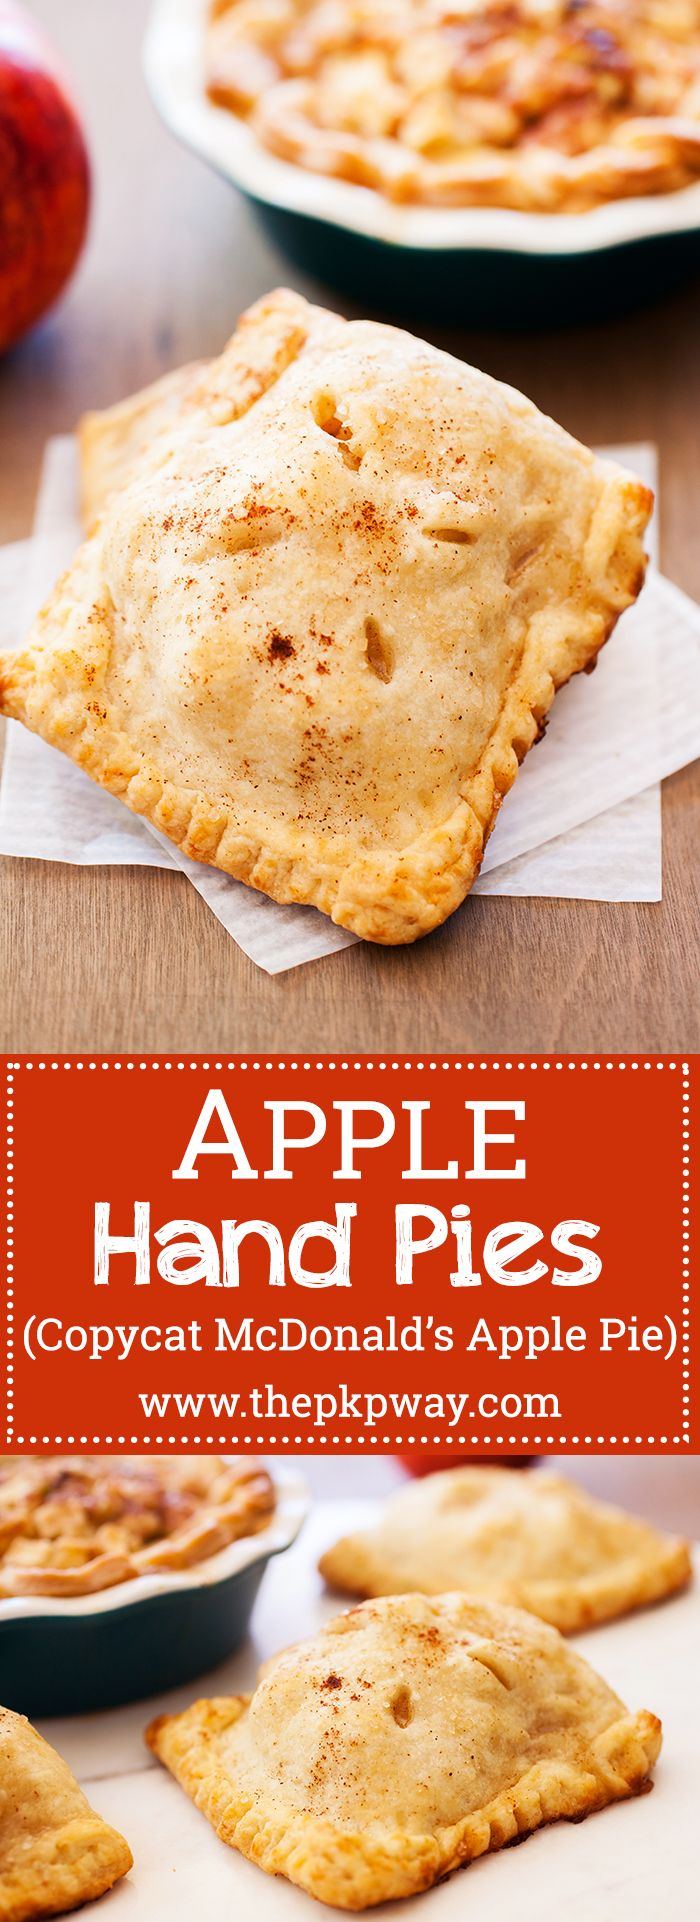 Apple Hand Pie | The PKP Way